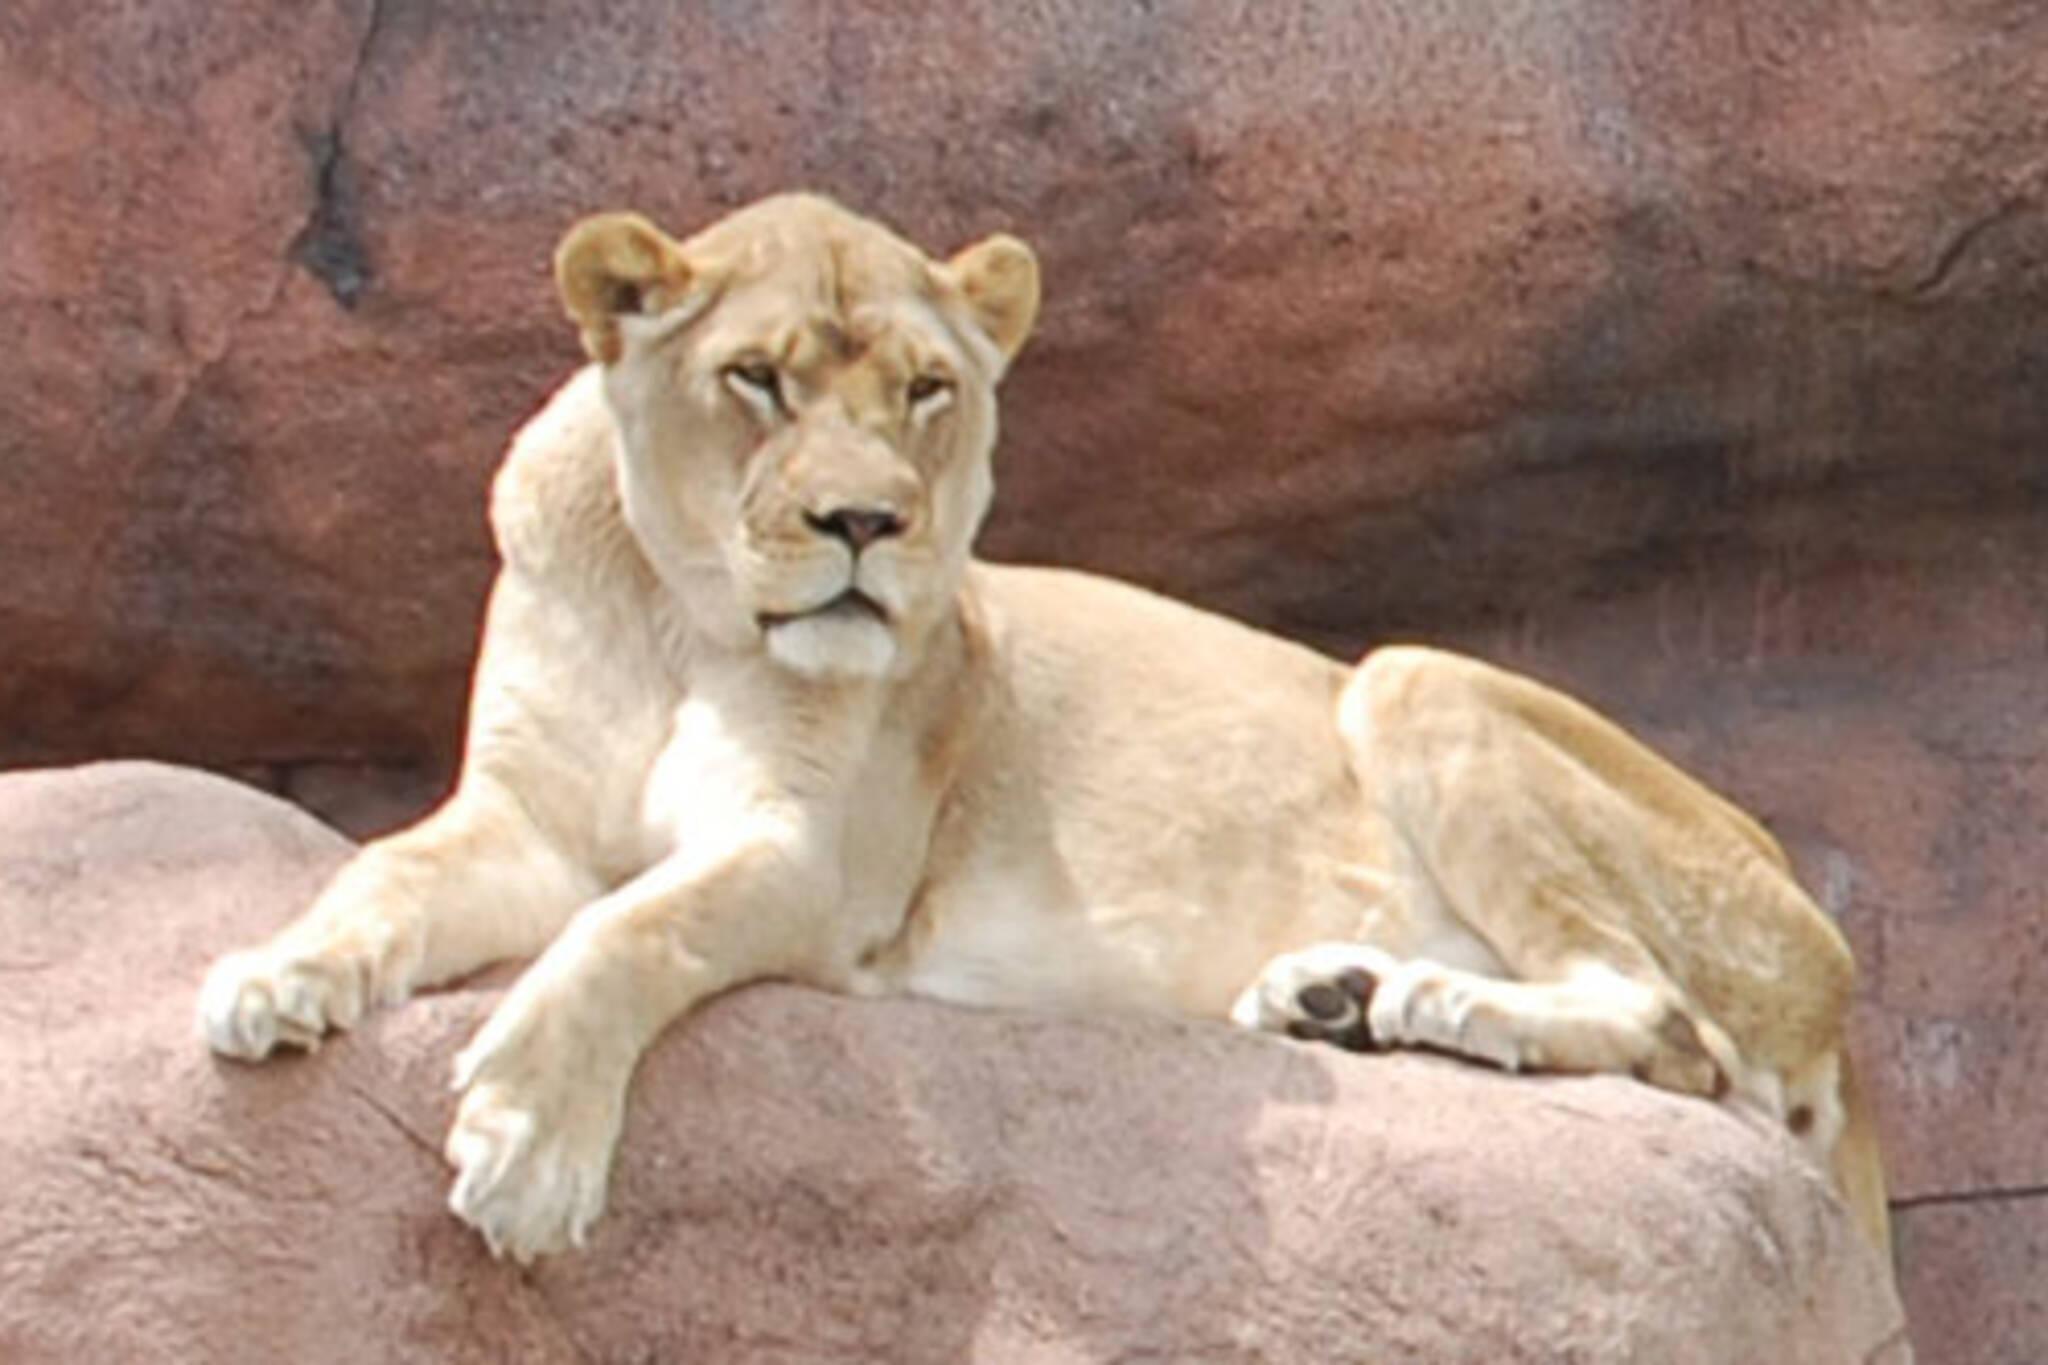 Eunuch Lion basking in the sun